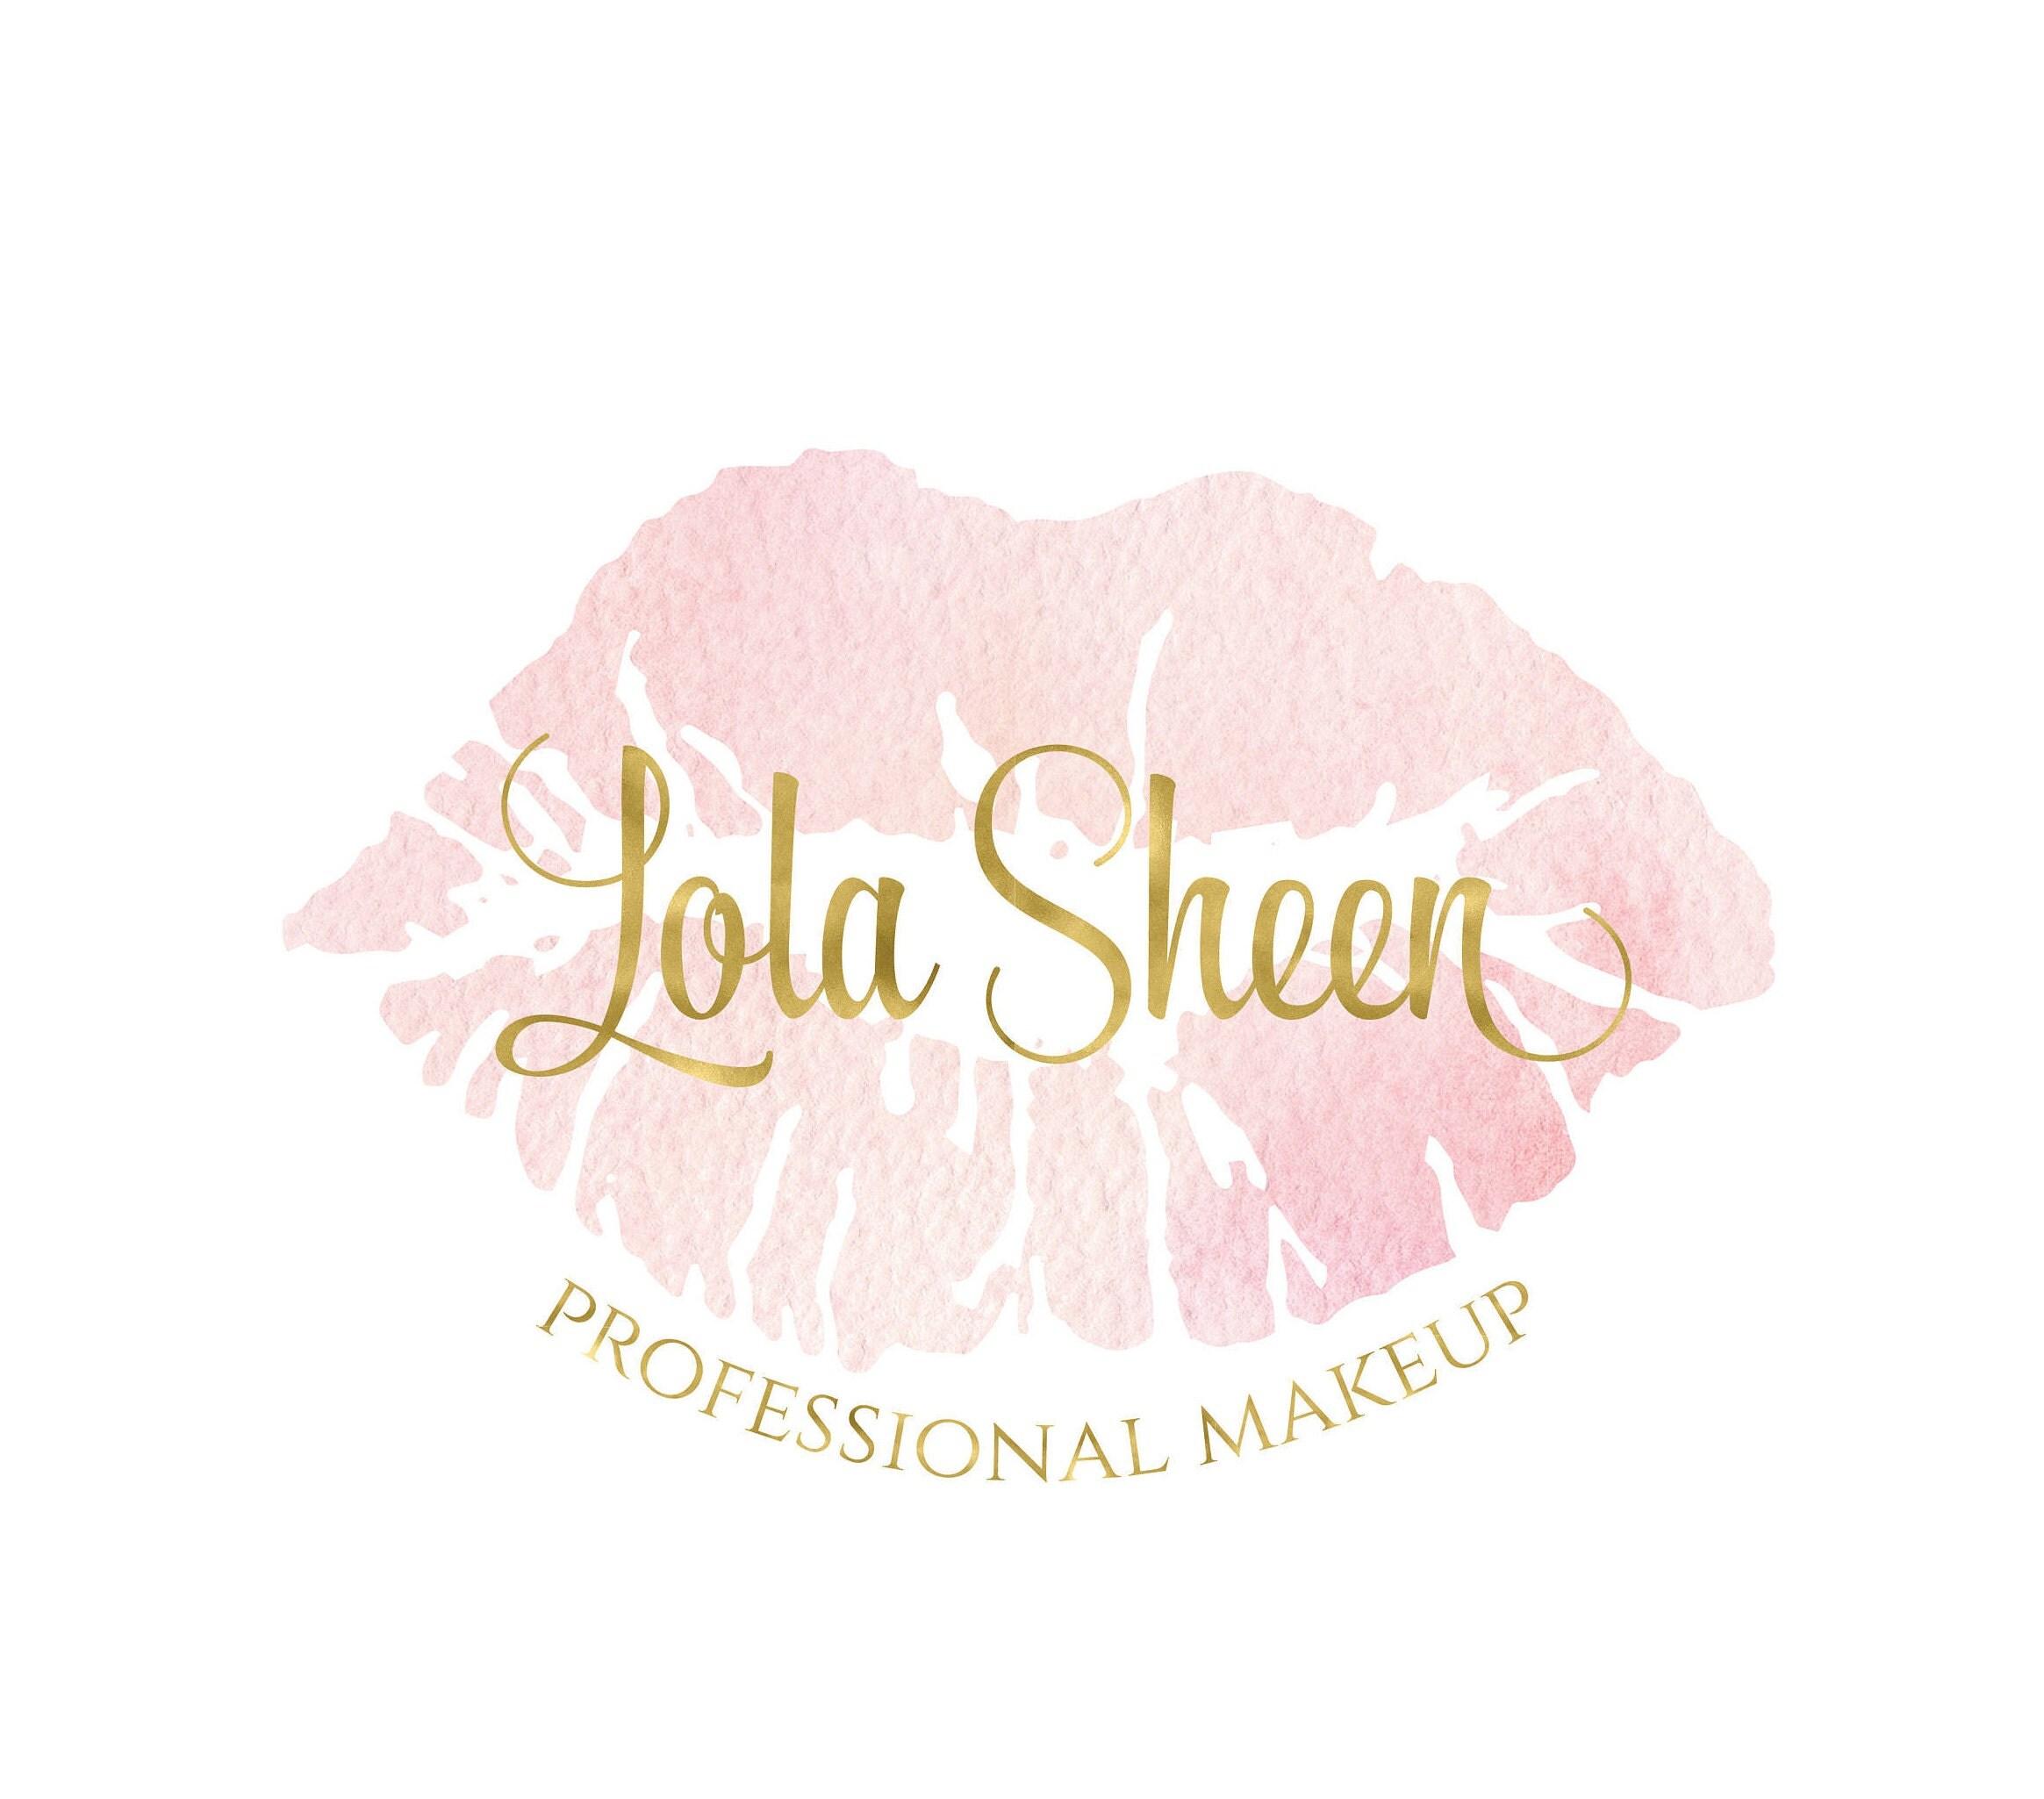 pink lip logo pink lipstick logo beauty blog logo makeup